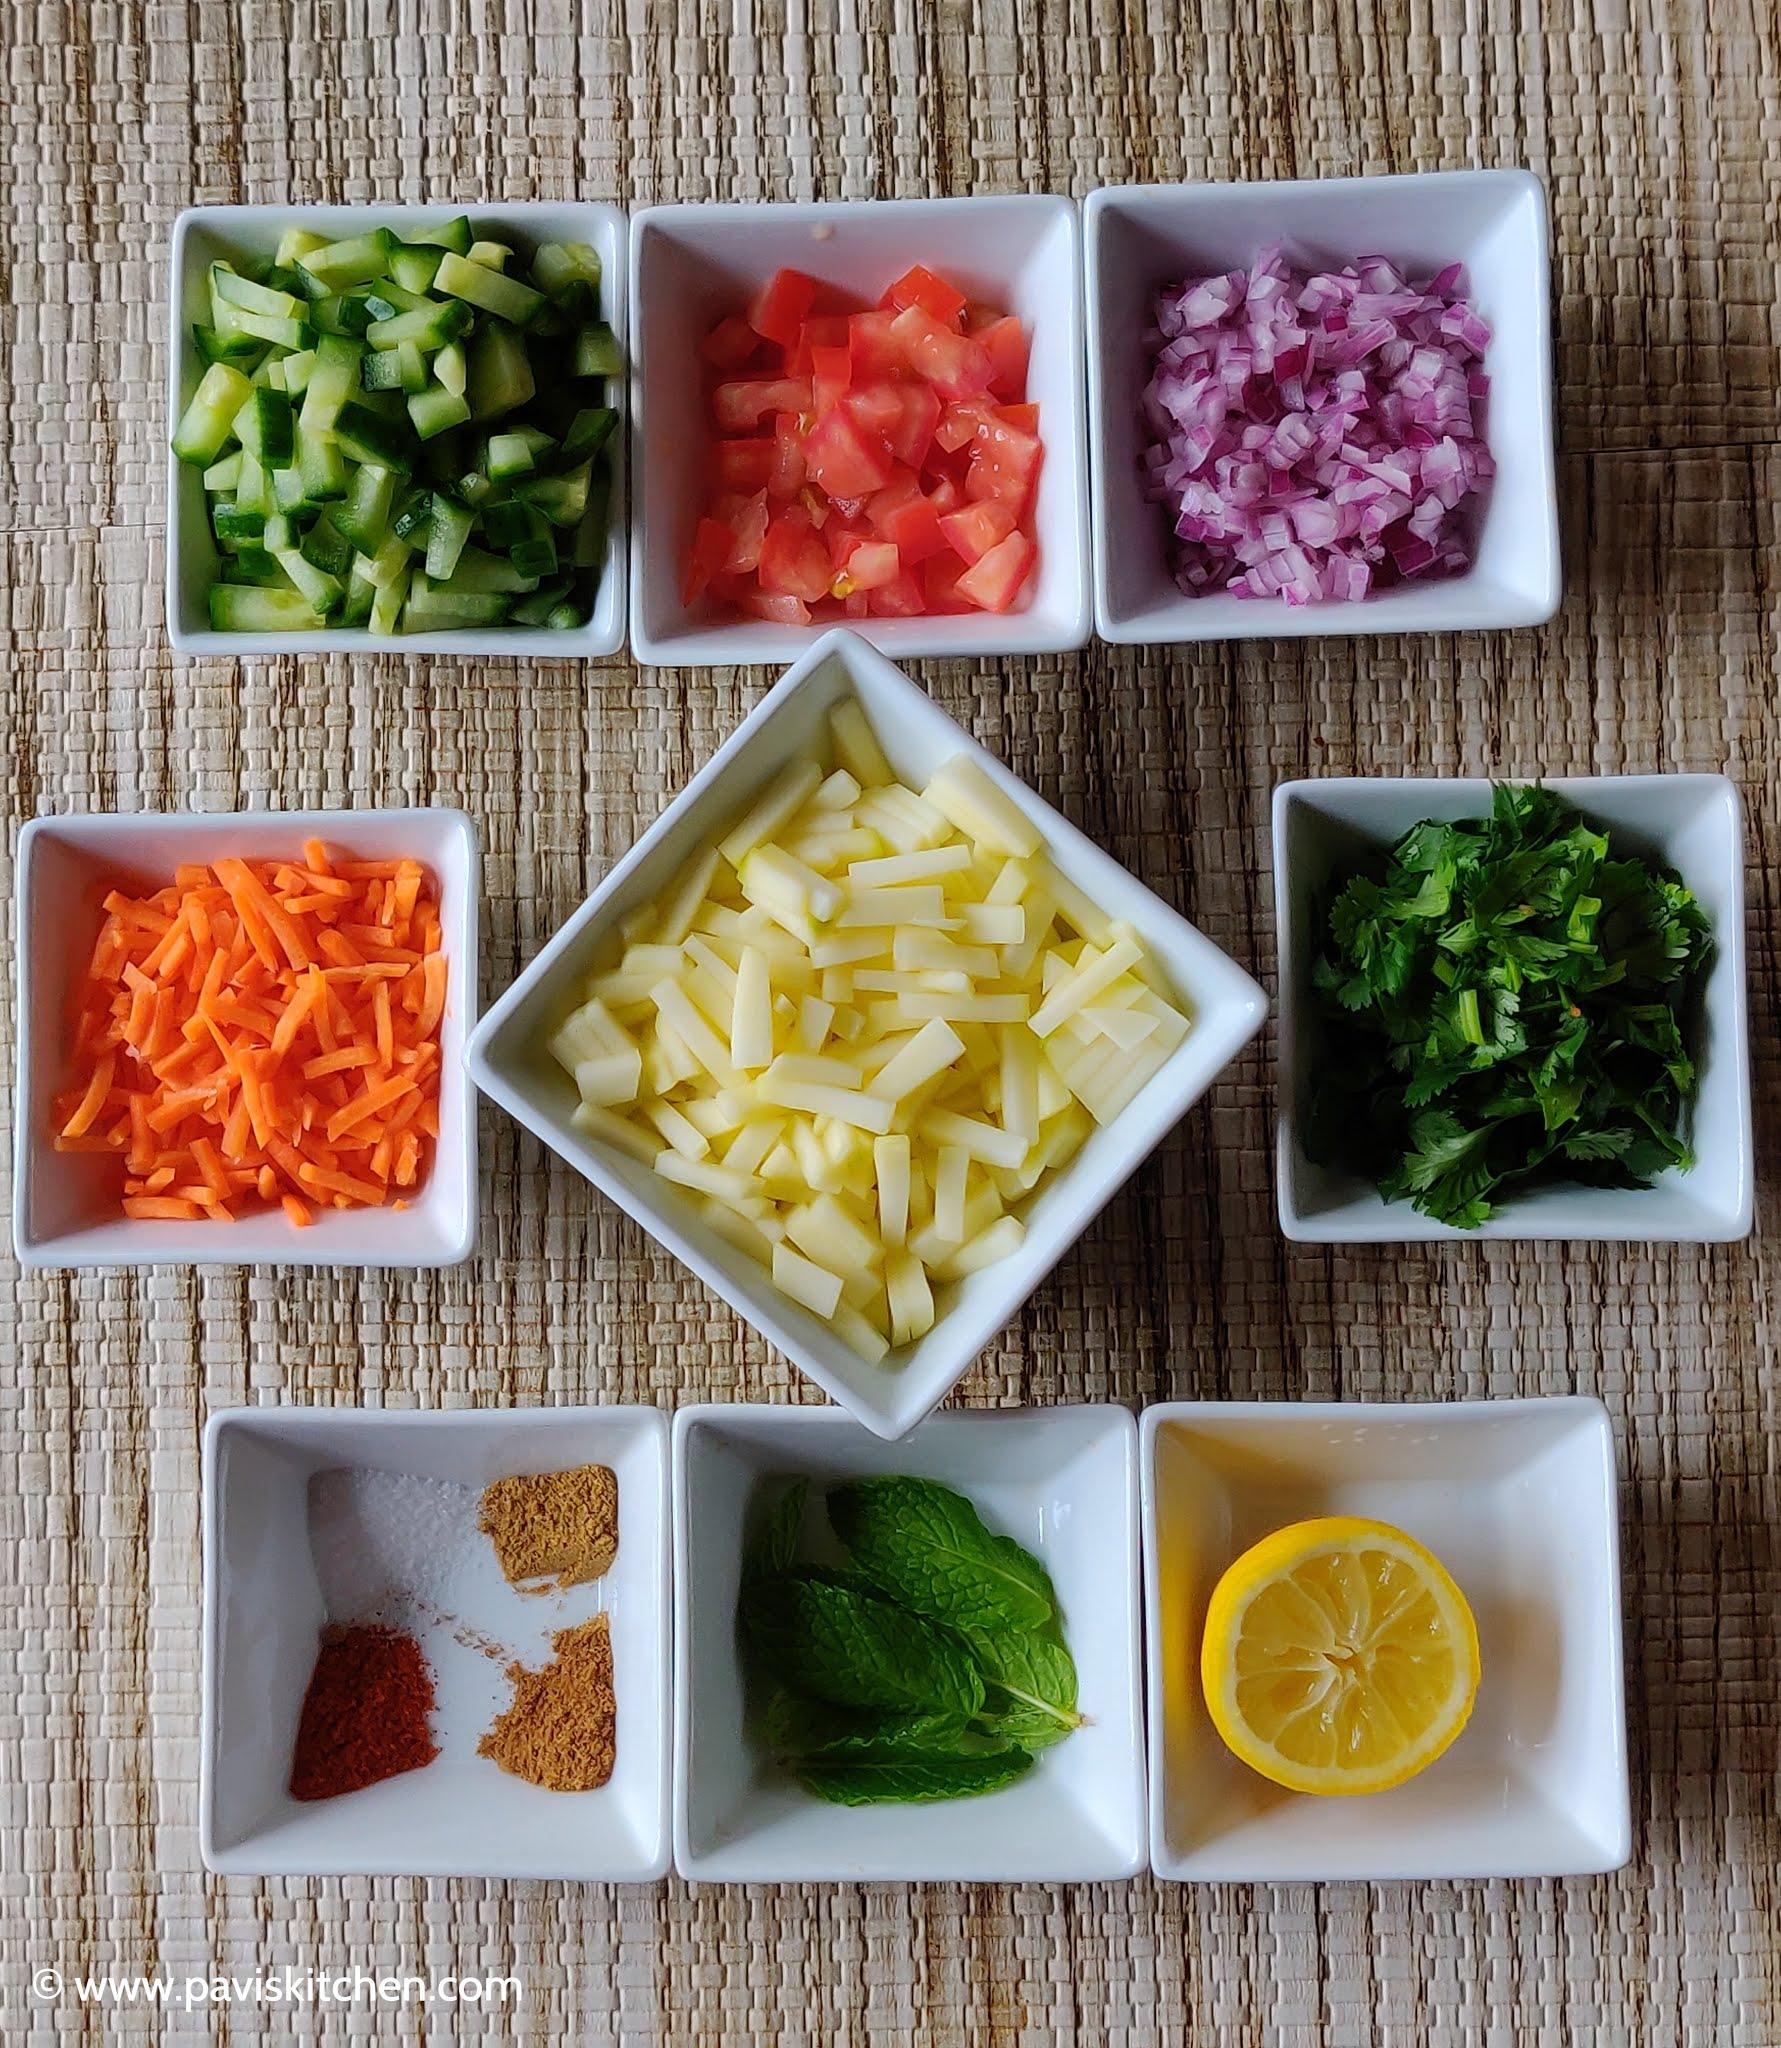 Spicy mango salad recipe | Indian mango salad recipe | Mango kosambari | Raw mango kachumber